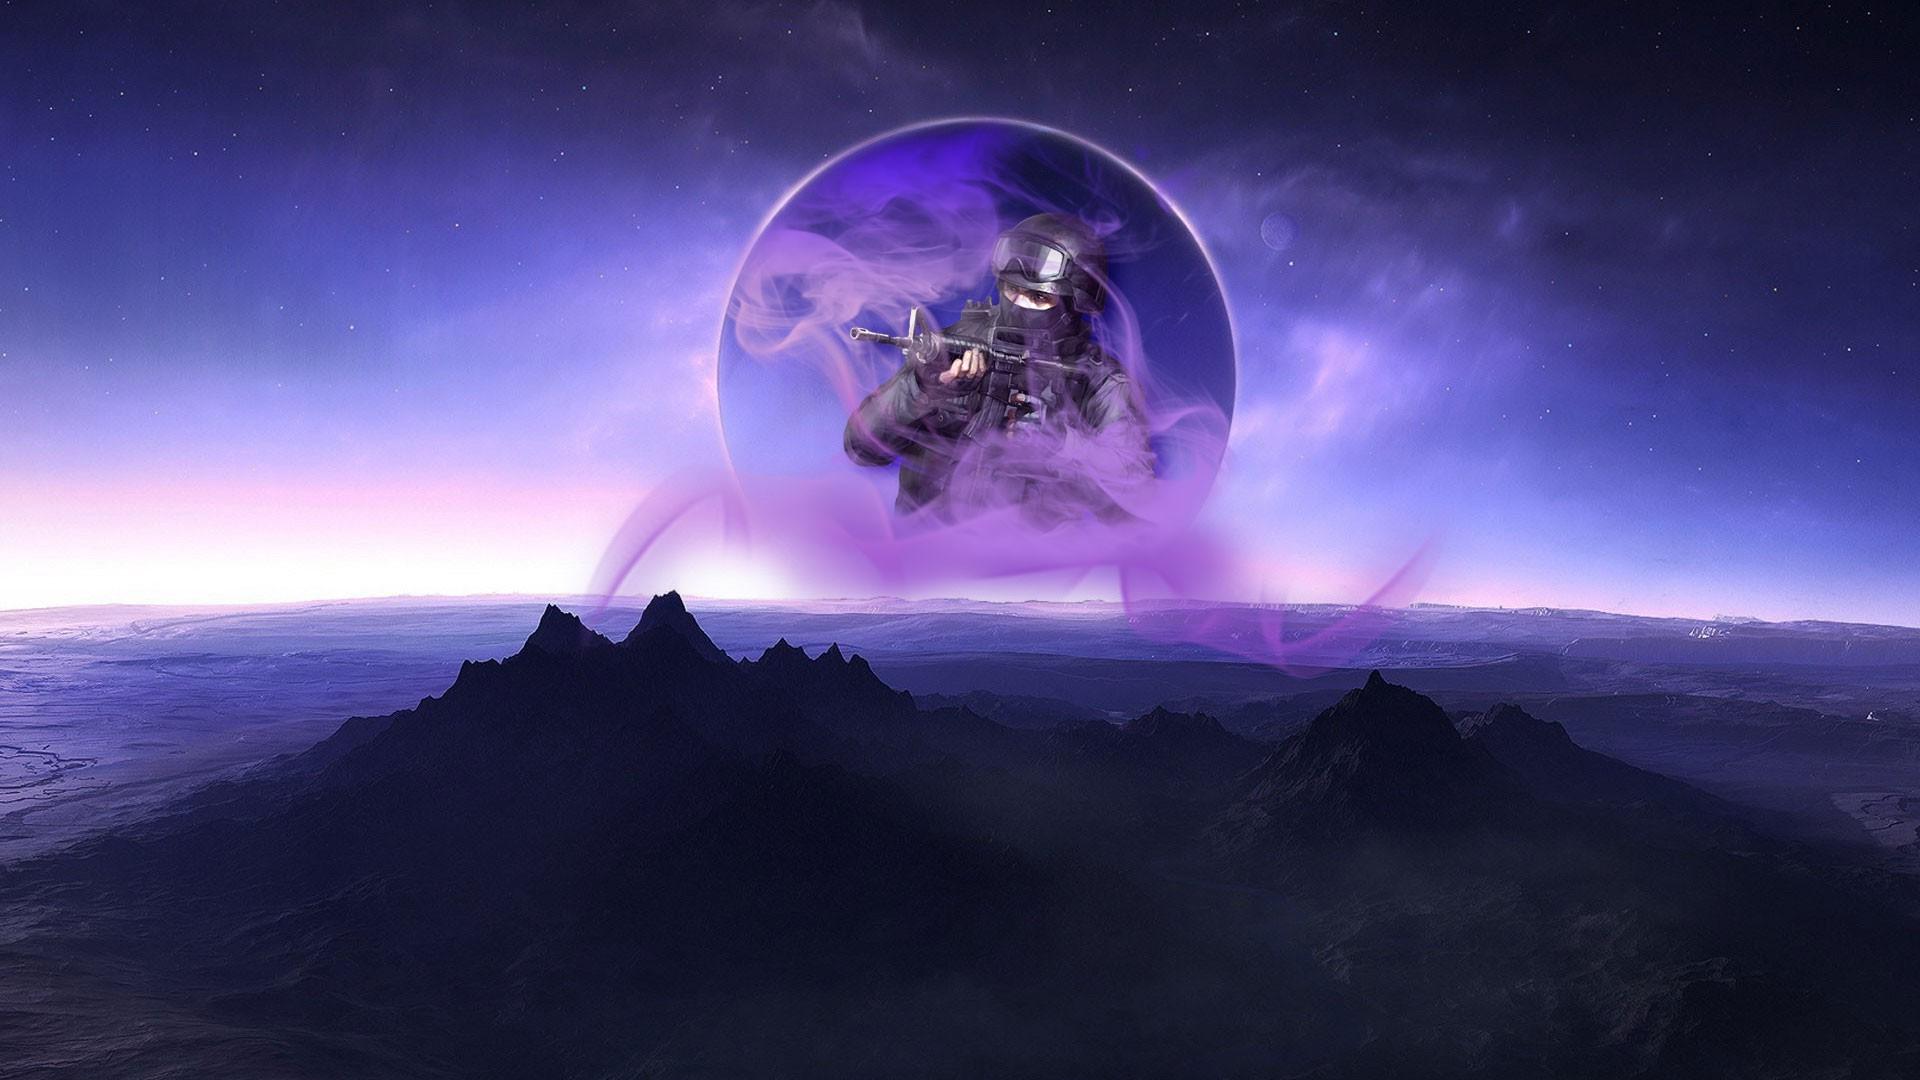 Fondos De Pantalla Videojuegos Planeta Púrpura Fumar